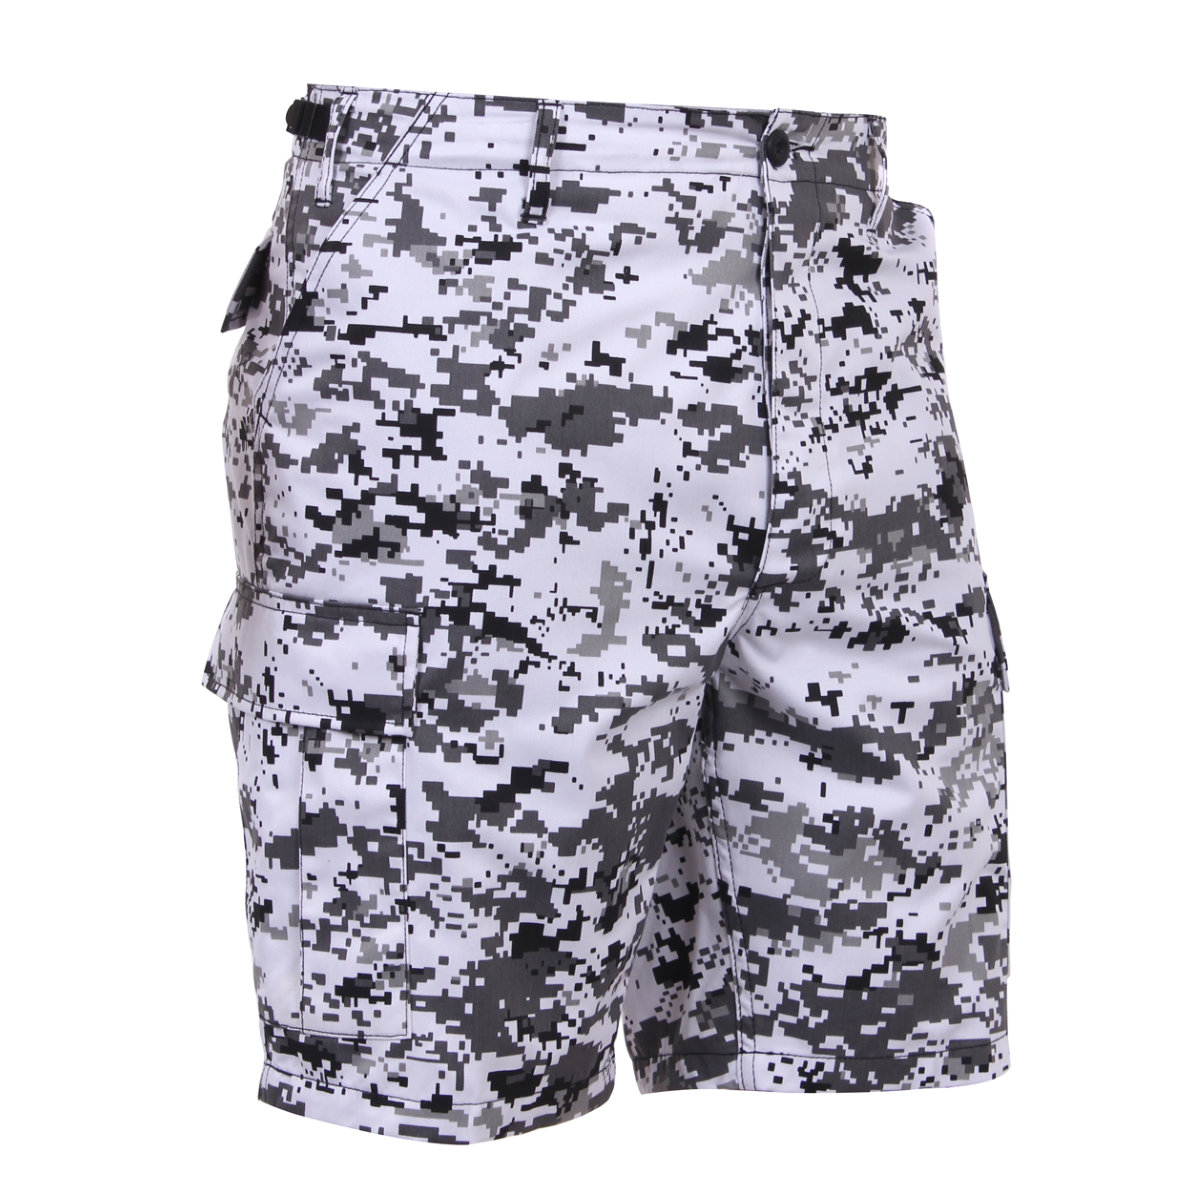 Rothco Rothco B.D.U Shorts, City Digital Camo